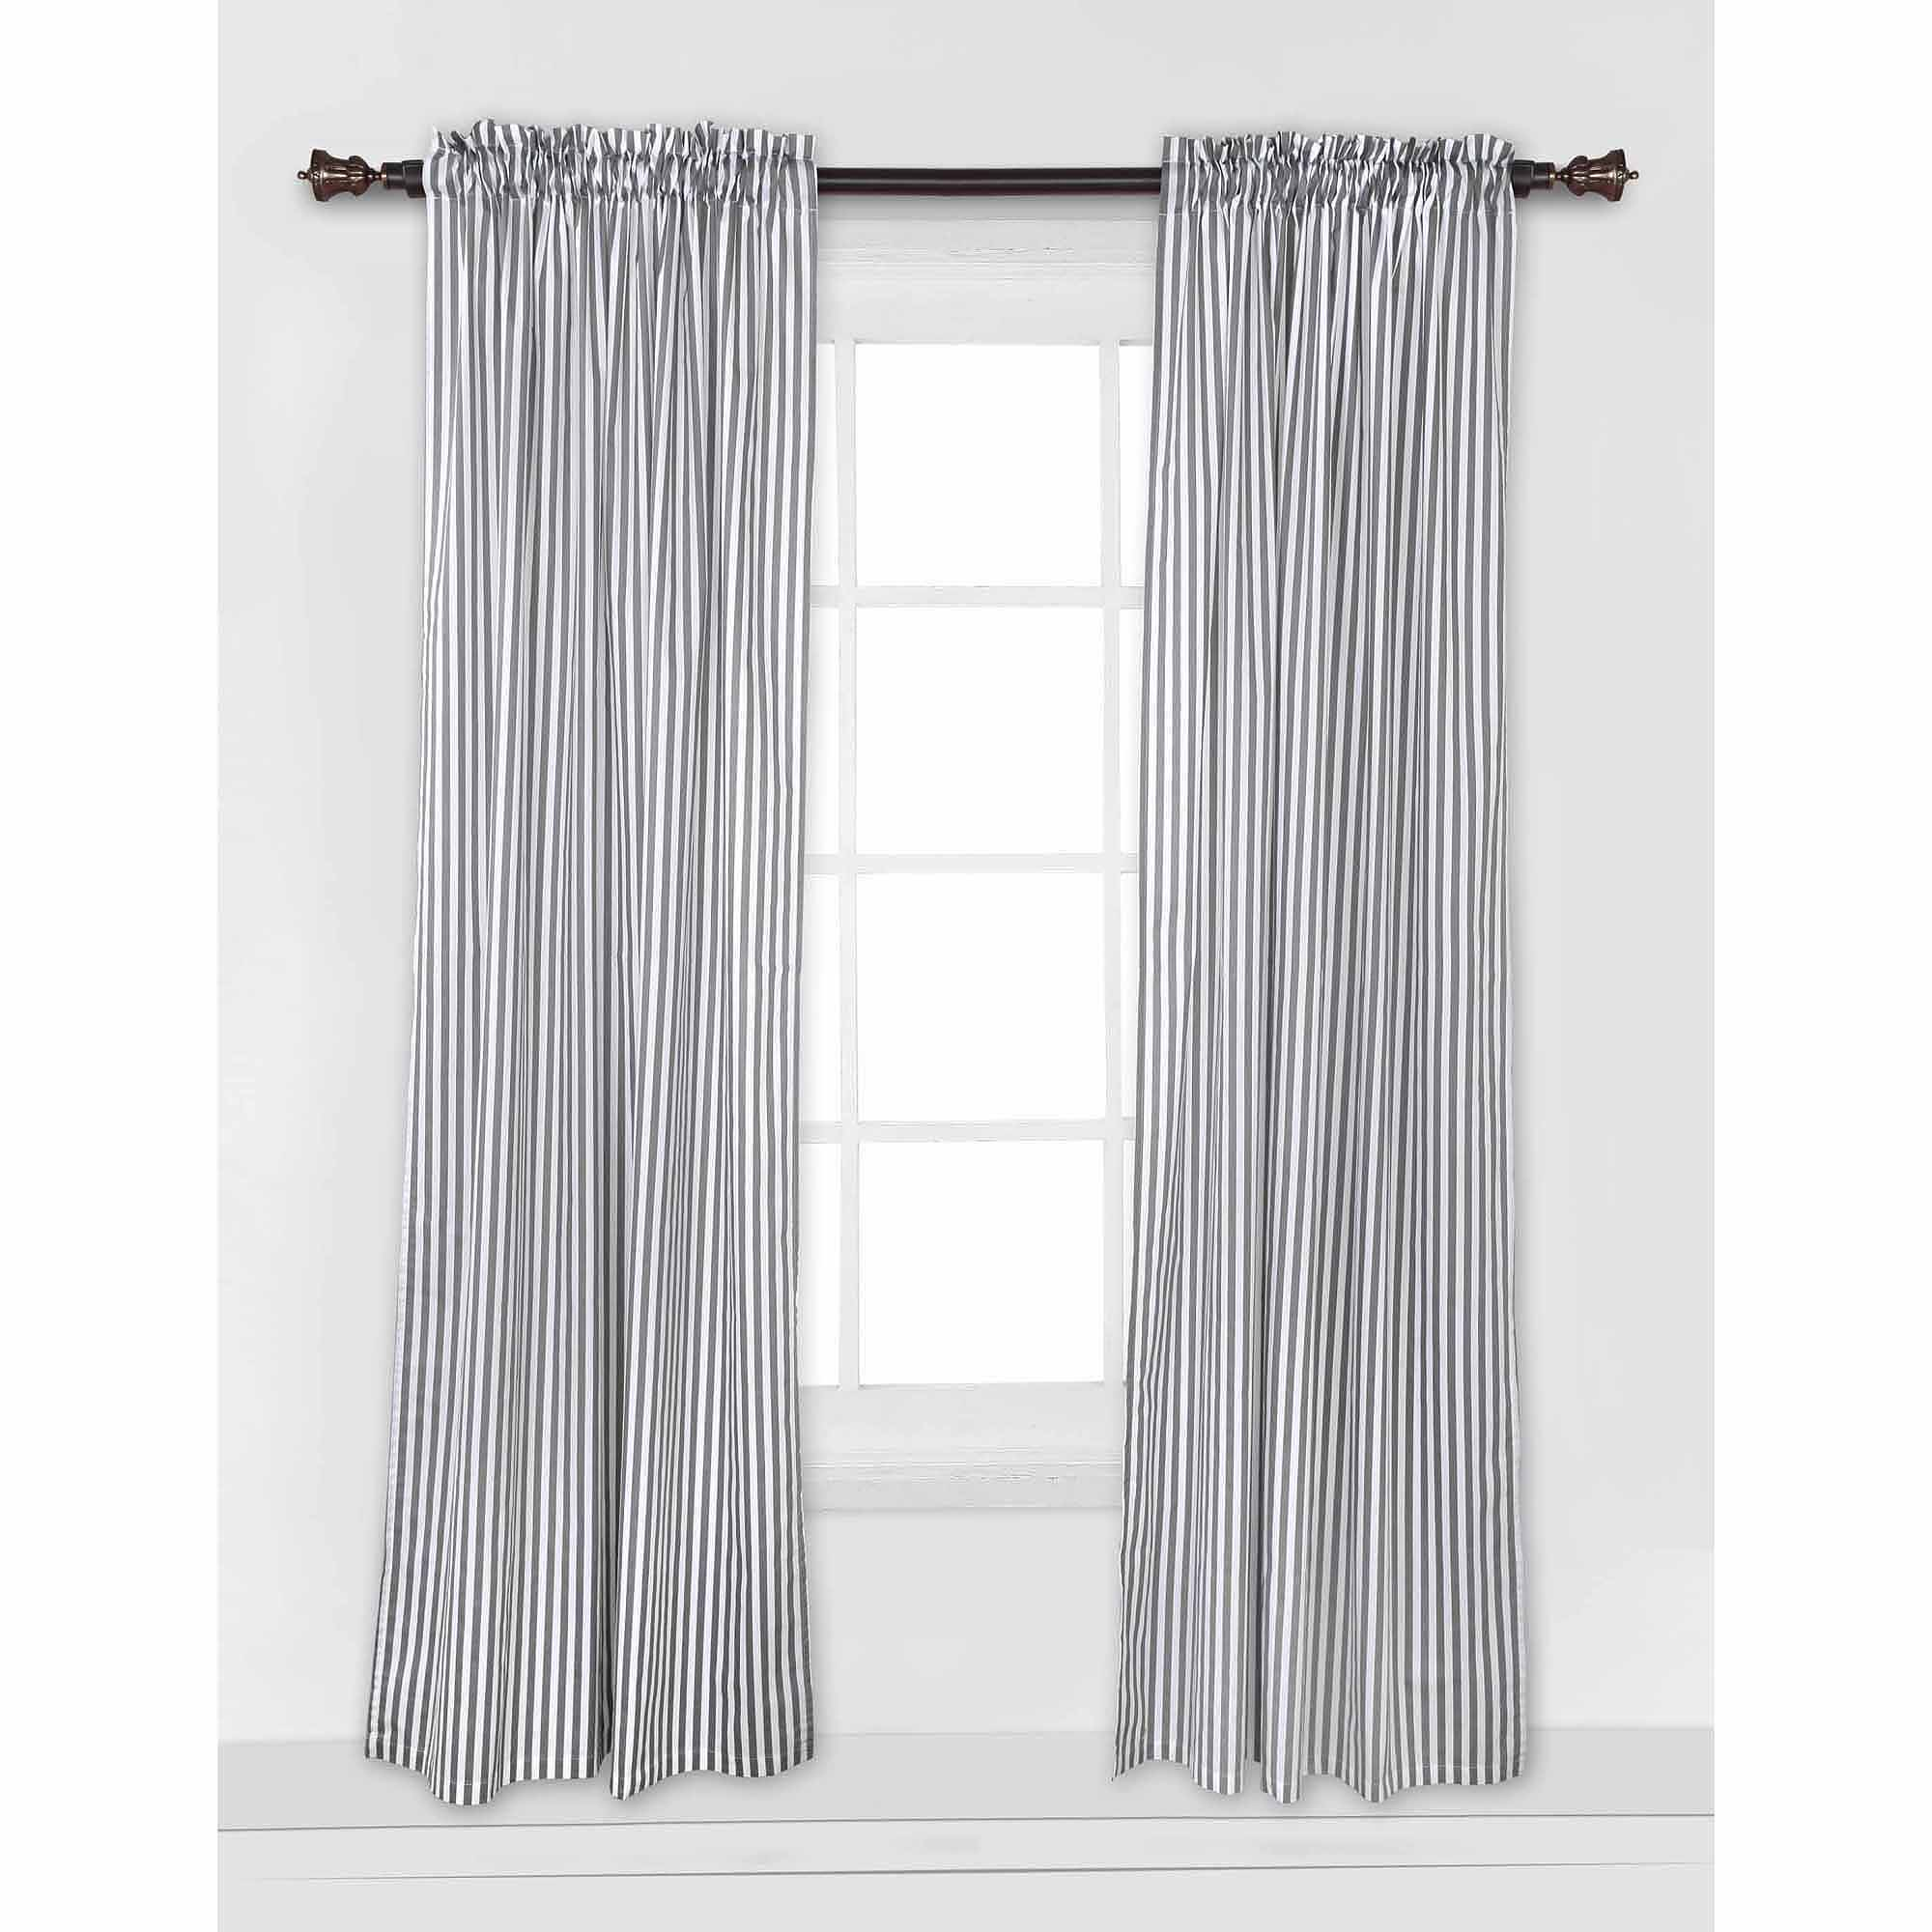 Bacati - MixNMatch Pin Dots Curtain Panel 42 x 84 inches 100% Cotton Percale Fabrics, Gray